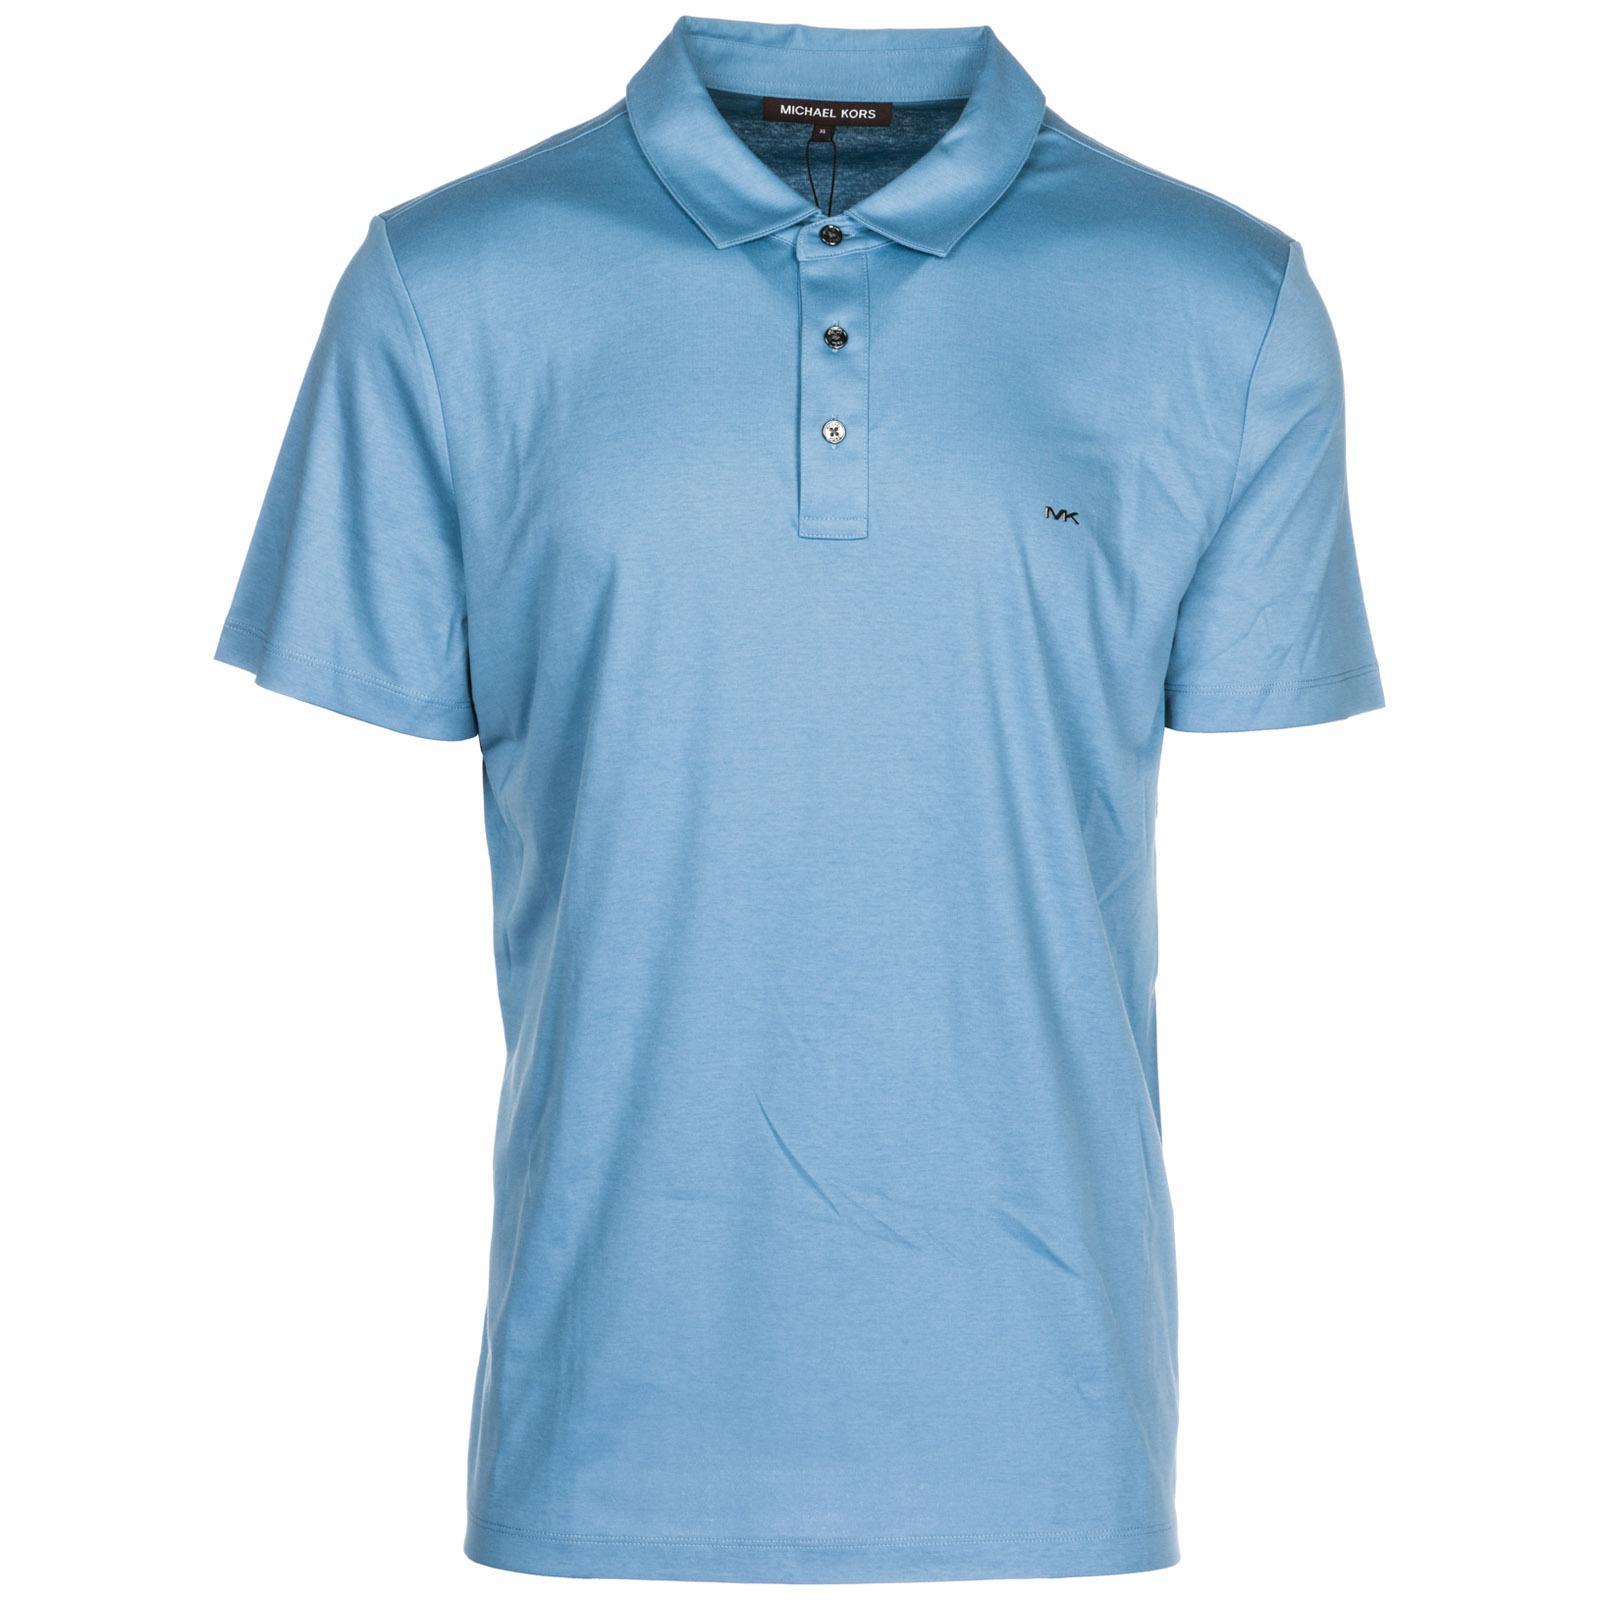 4e53c0a8 Michael Kors Men's Short Sleeve T-Shirt Polo Collar In Blue | ModeSens